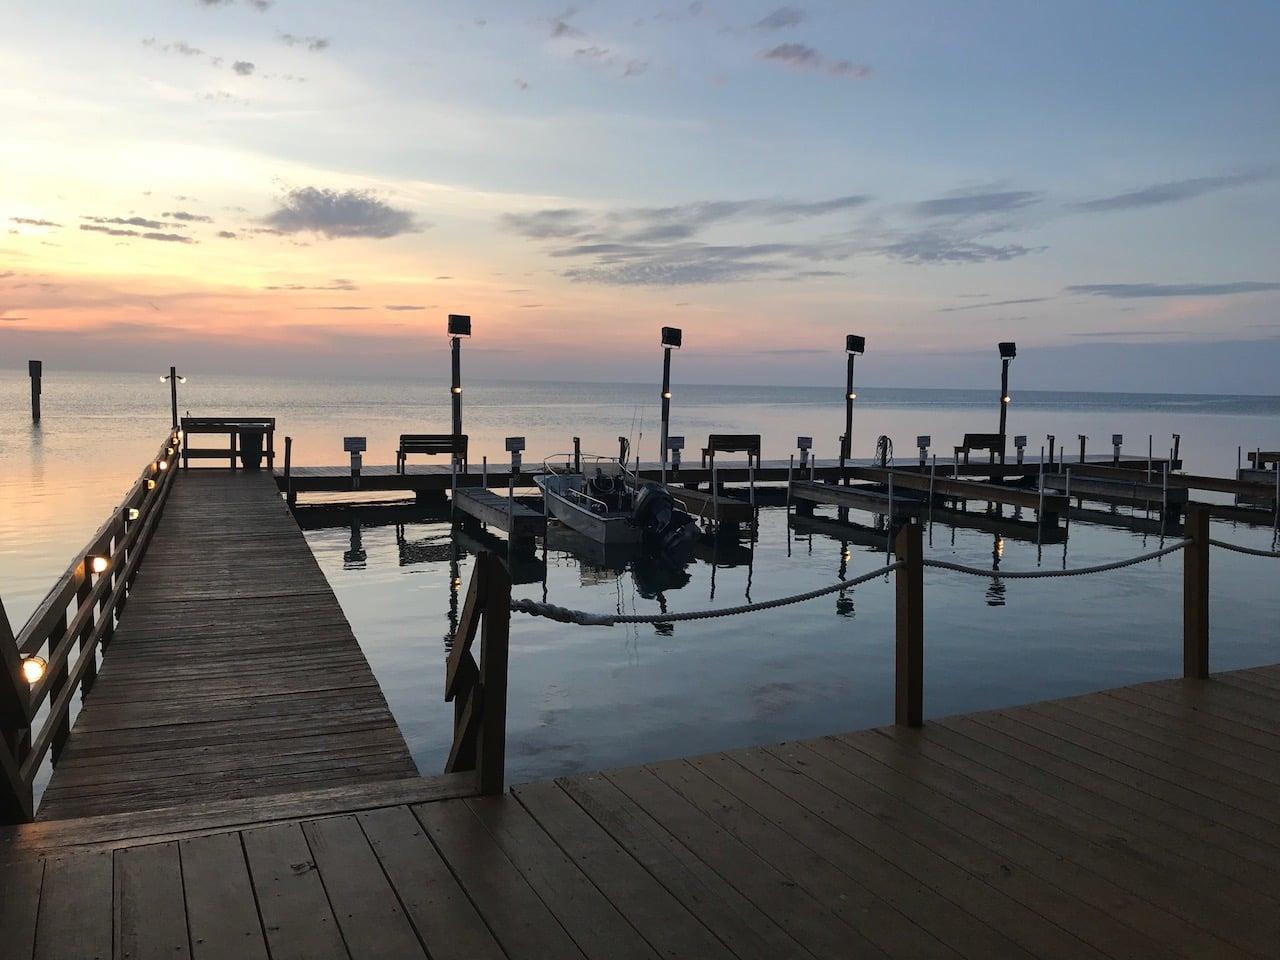 Coastal Lifestyles Luxury Rentals Padre Island Boat Dock Sunset Fishing